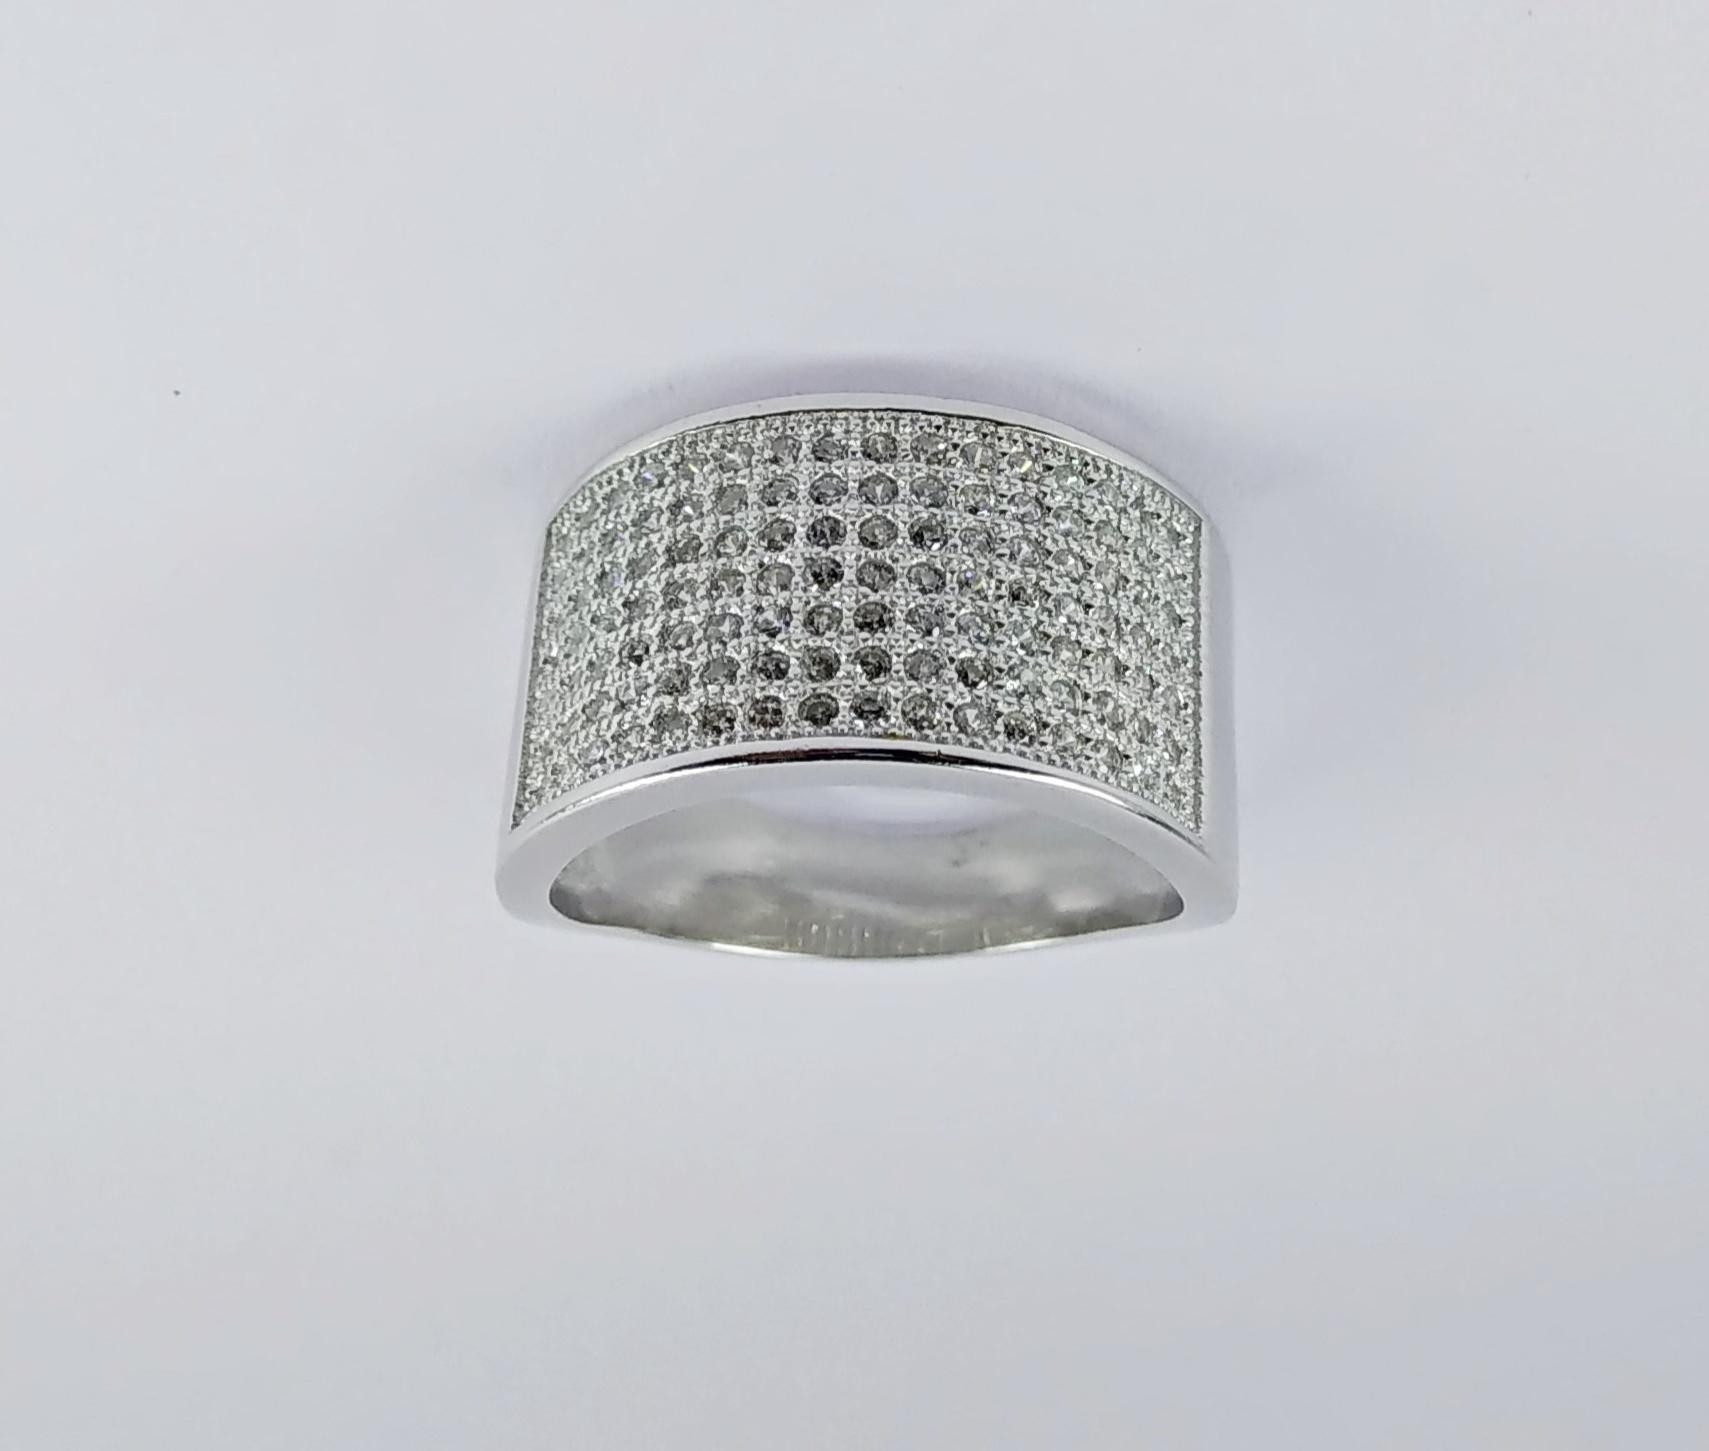 Maharaja style ring for  men